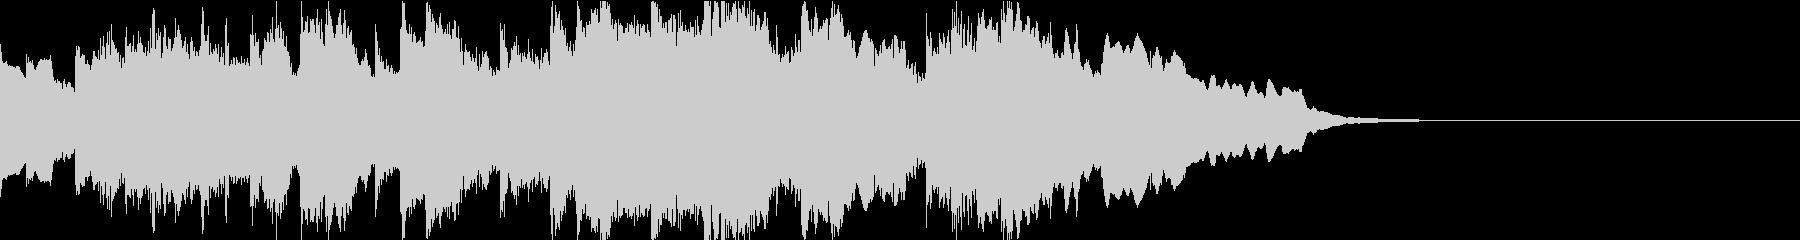 CM向けオルガンの暖かな雰囲気のBGMの未再生の波形